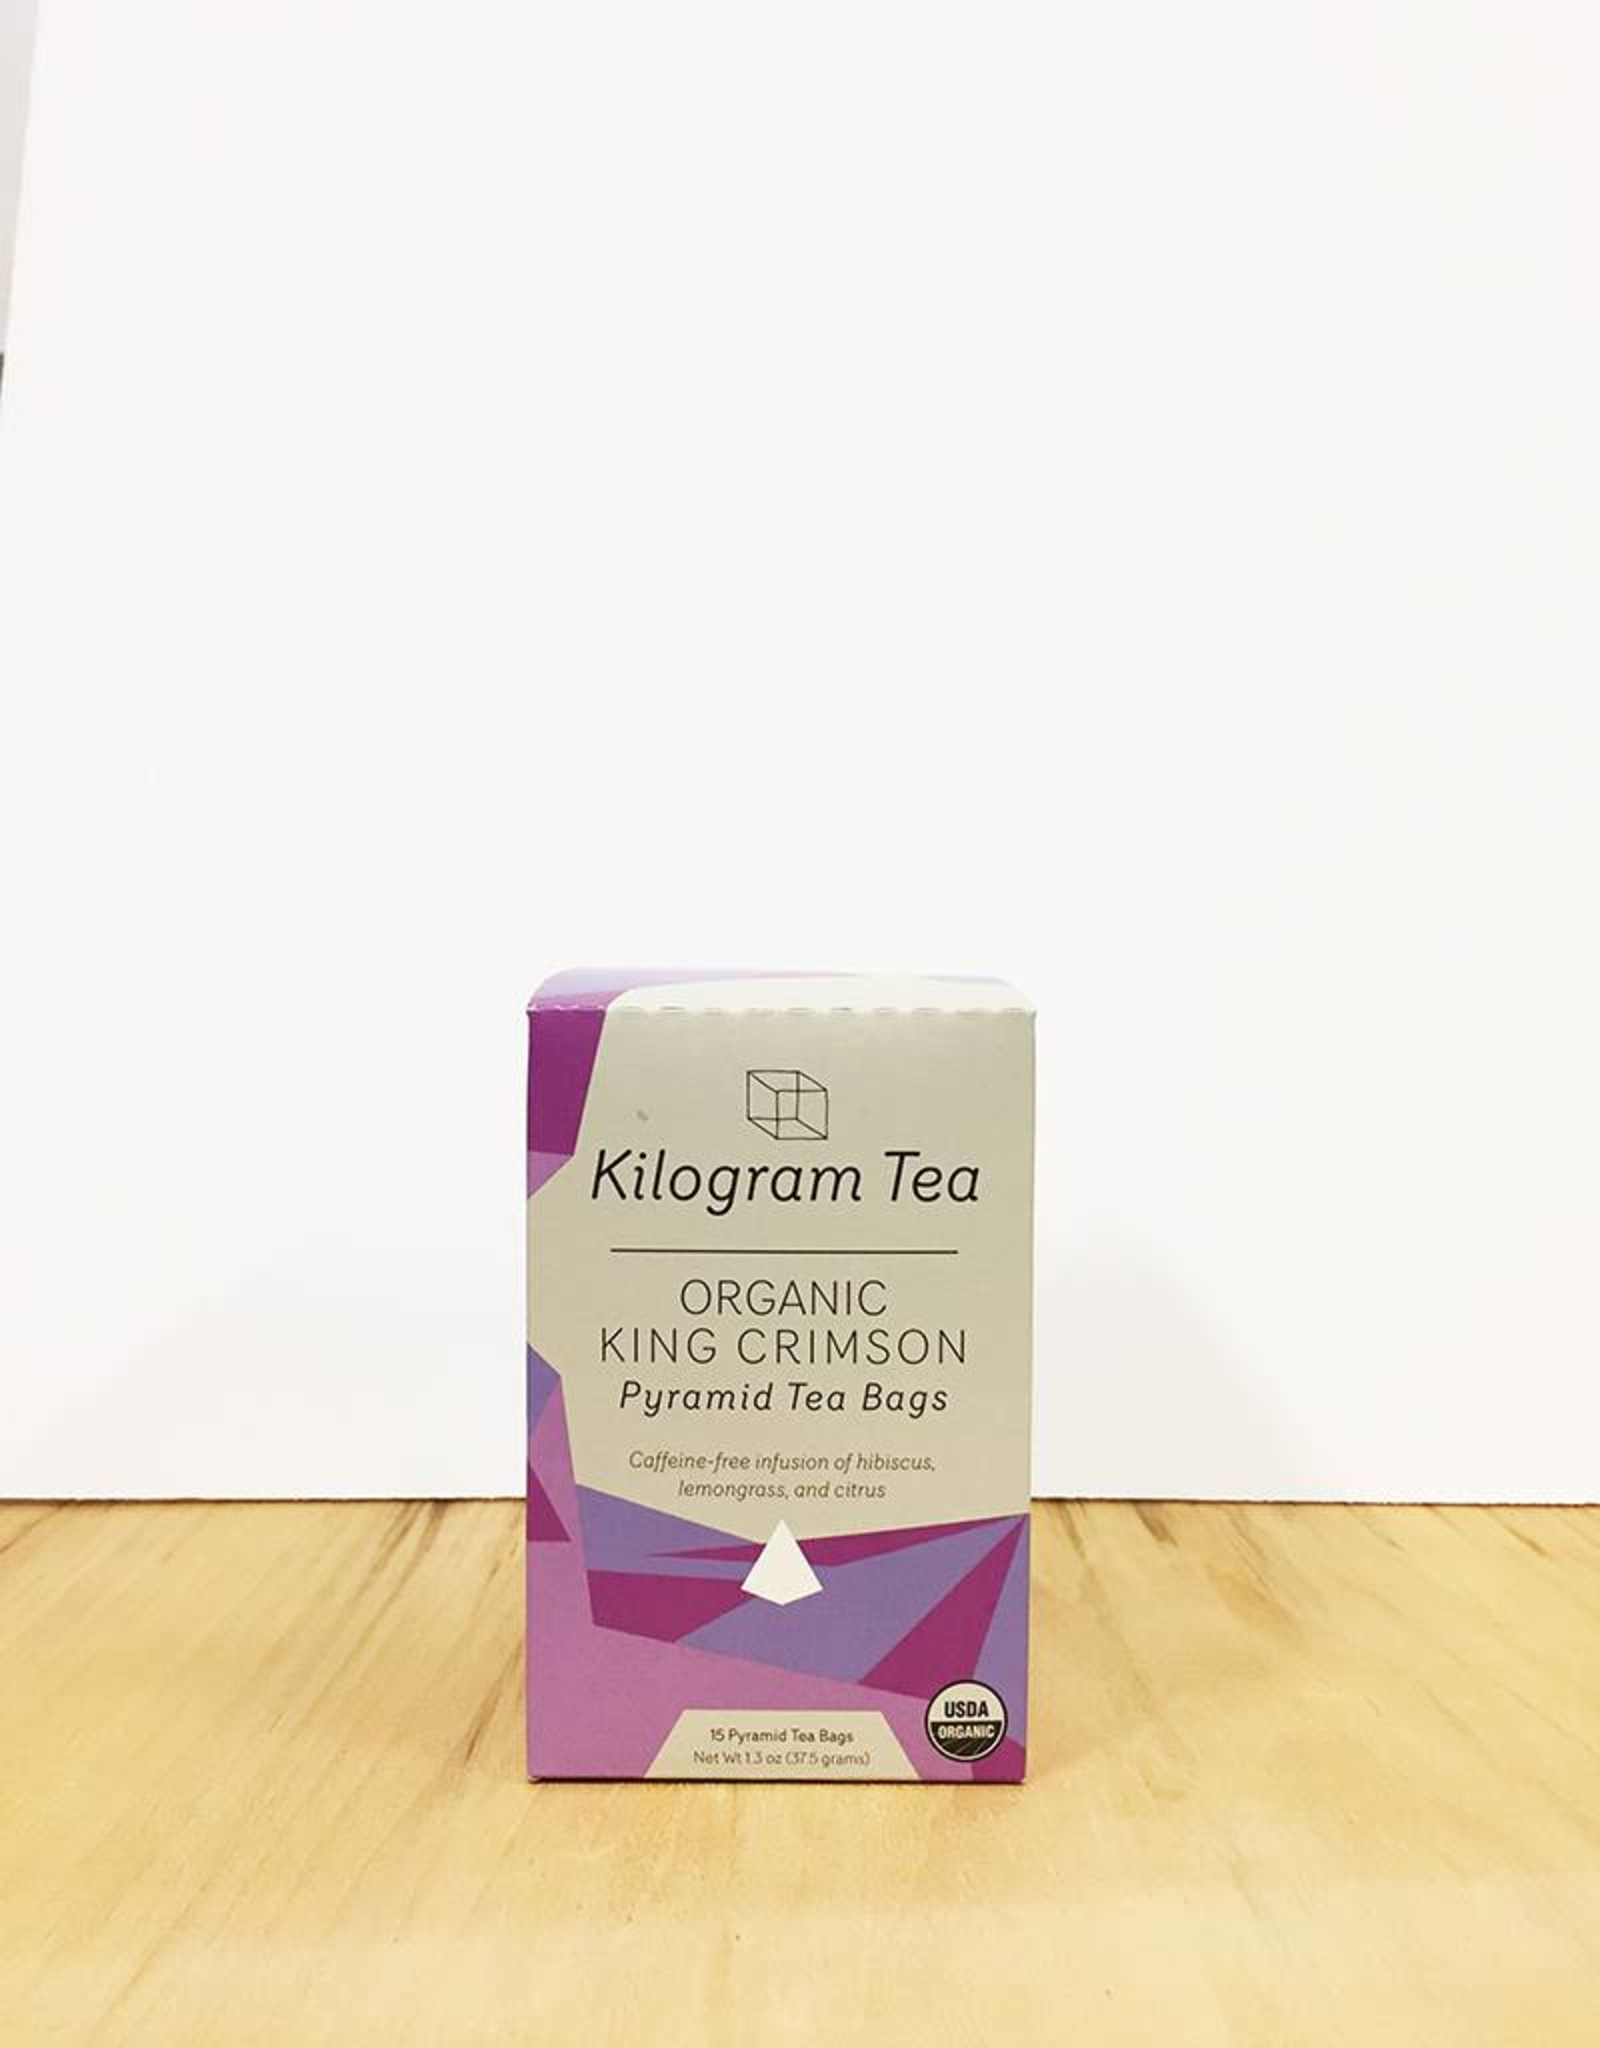 Kilogram Tea Kilogram Organic Teabags (King Crimson)